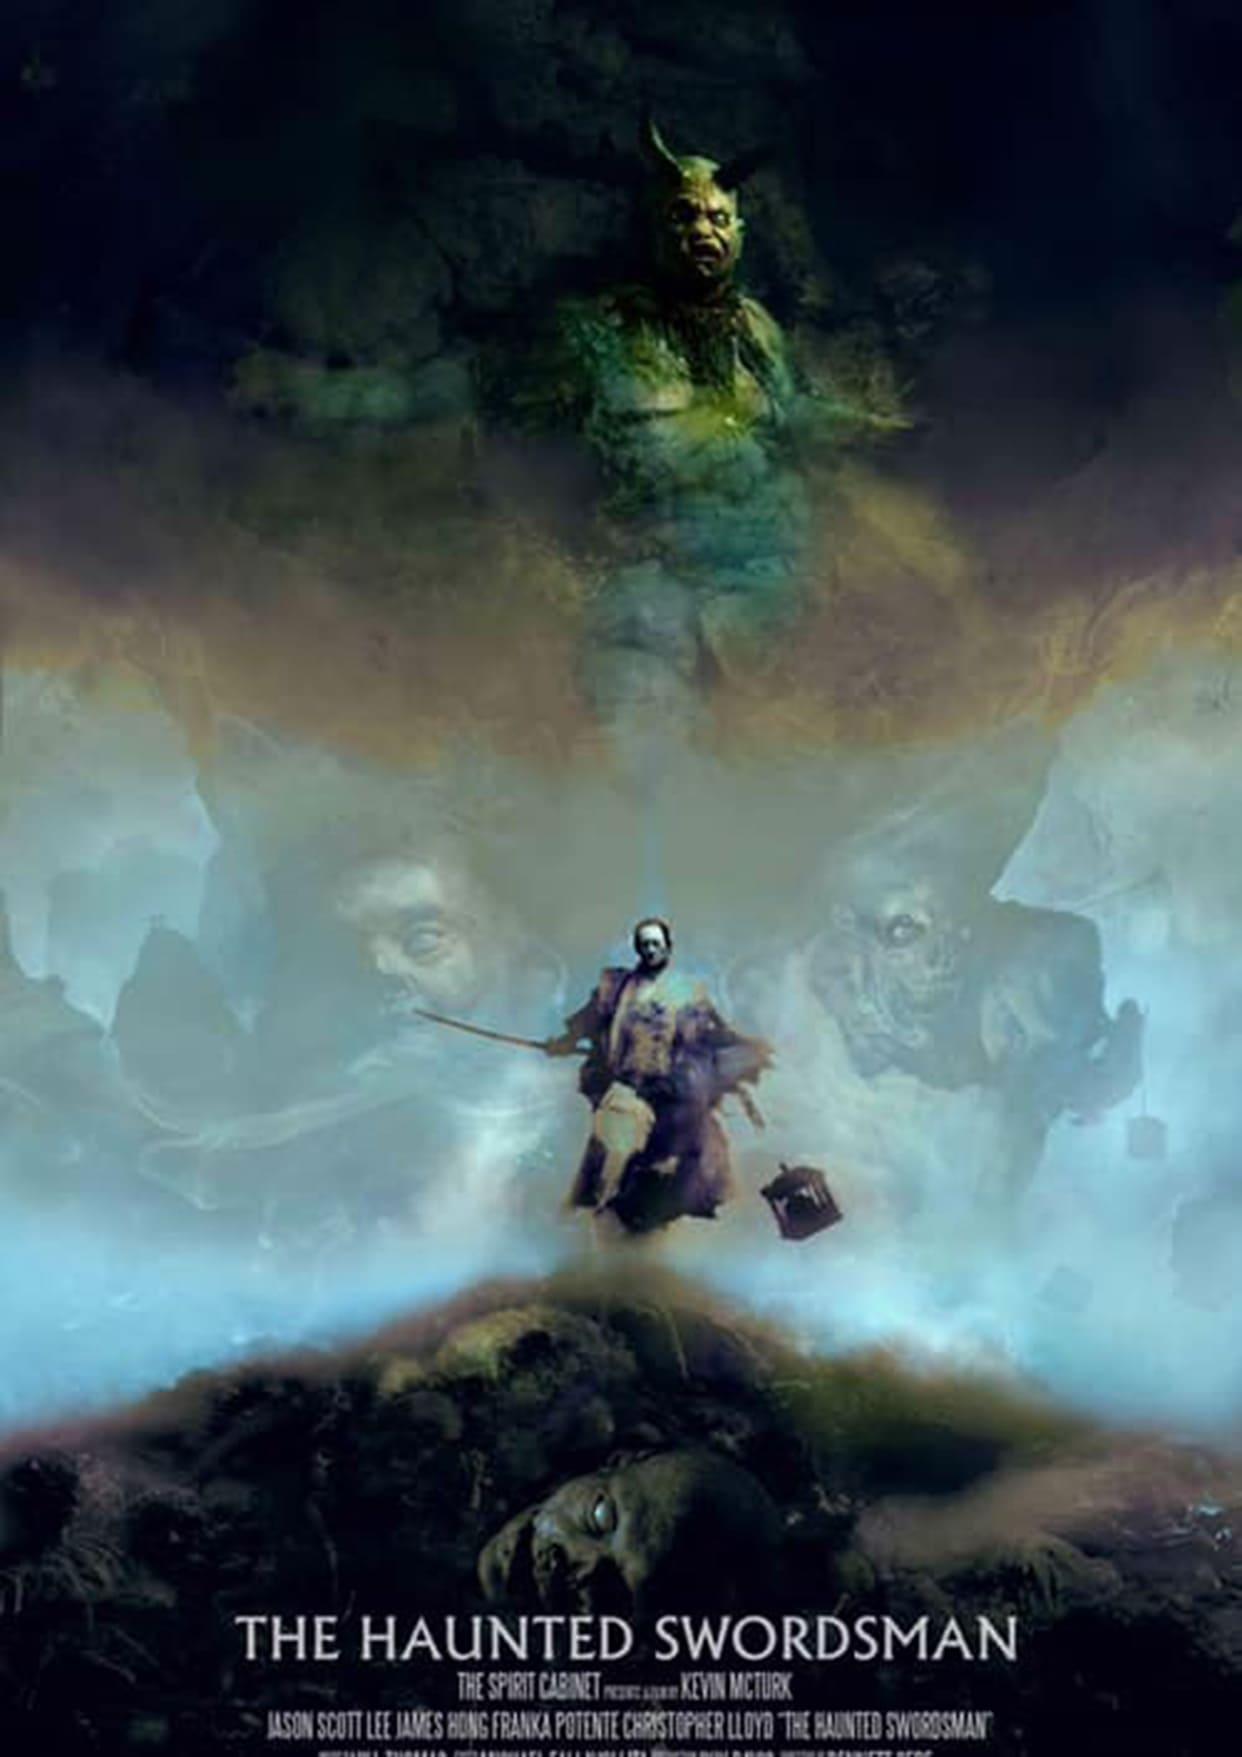 The Haunted Swordsman